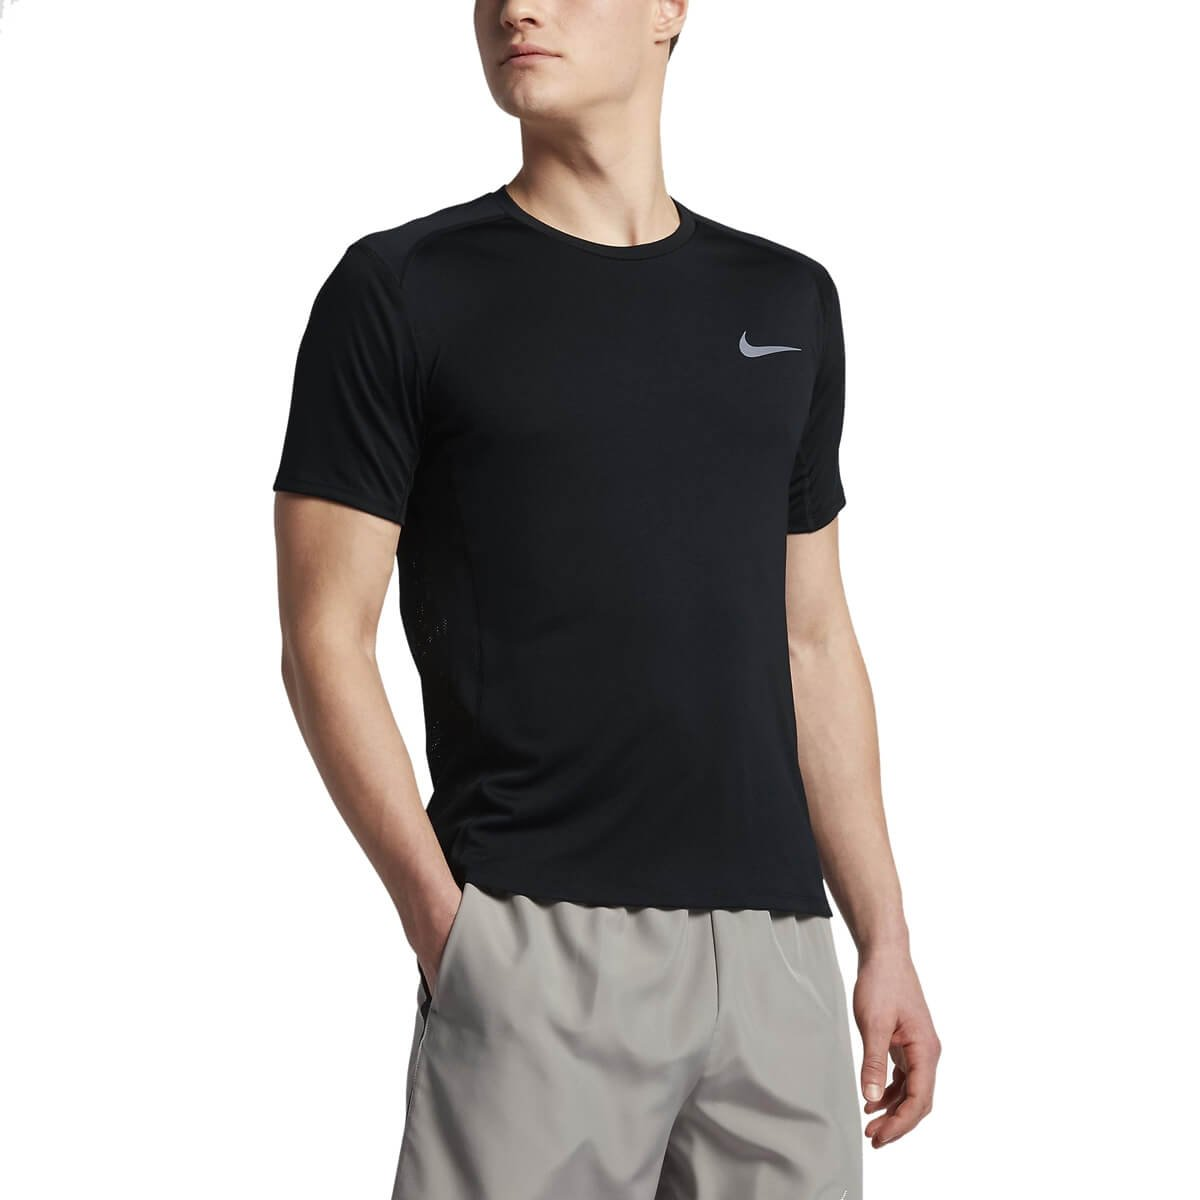 2c86c2cbd7 Bizz Store - Camiseta Masculina Nike Dry Miler Top Corrida